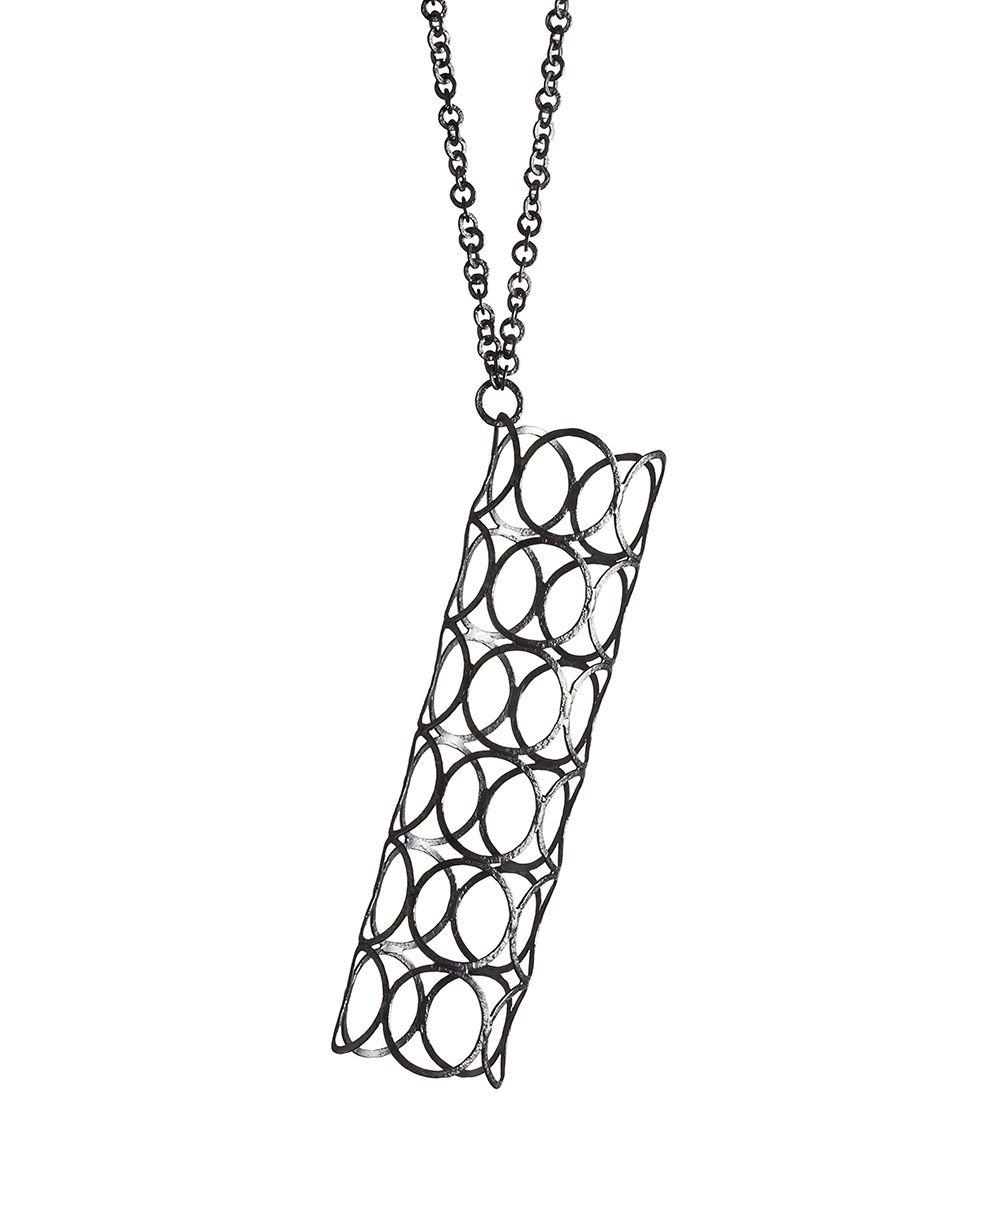 nikolay sardamov. necklace: garden city 2, 2017. blackened silver